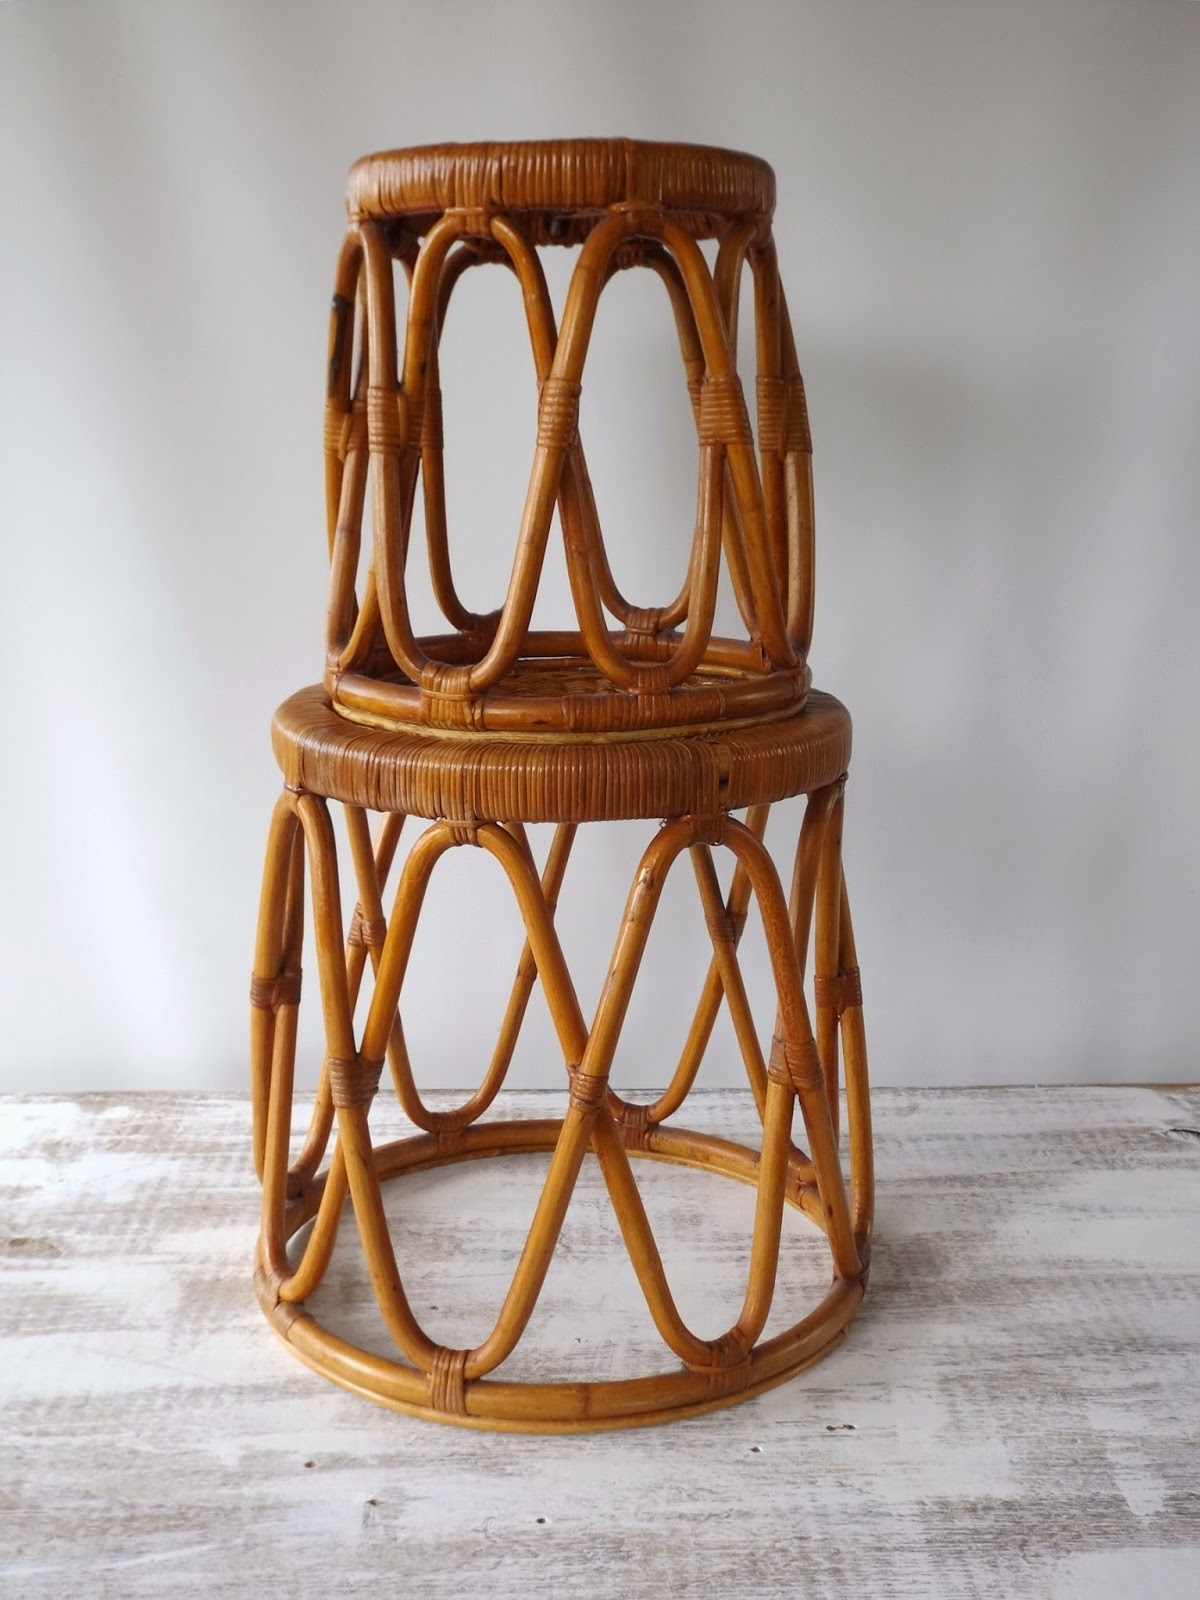 how to fix broken cane stool